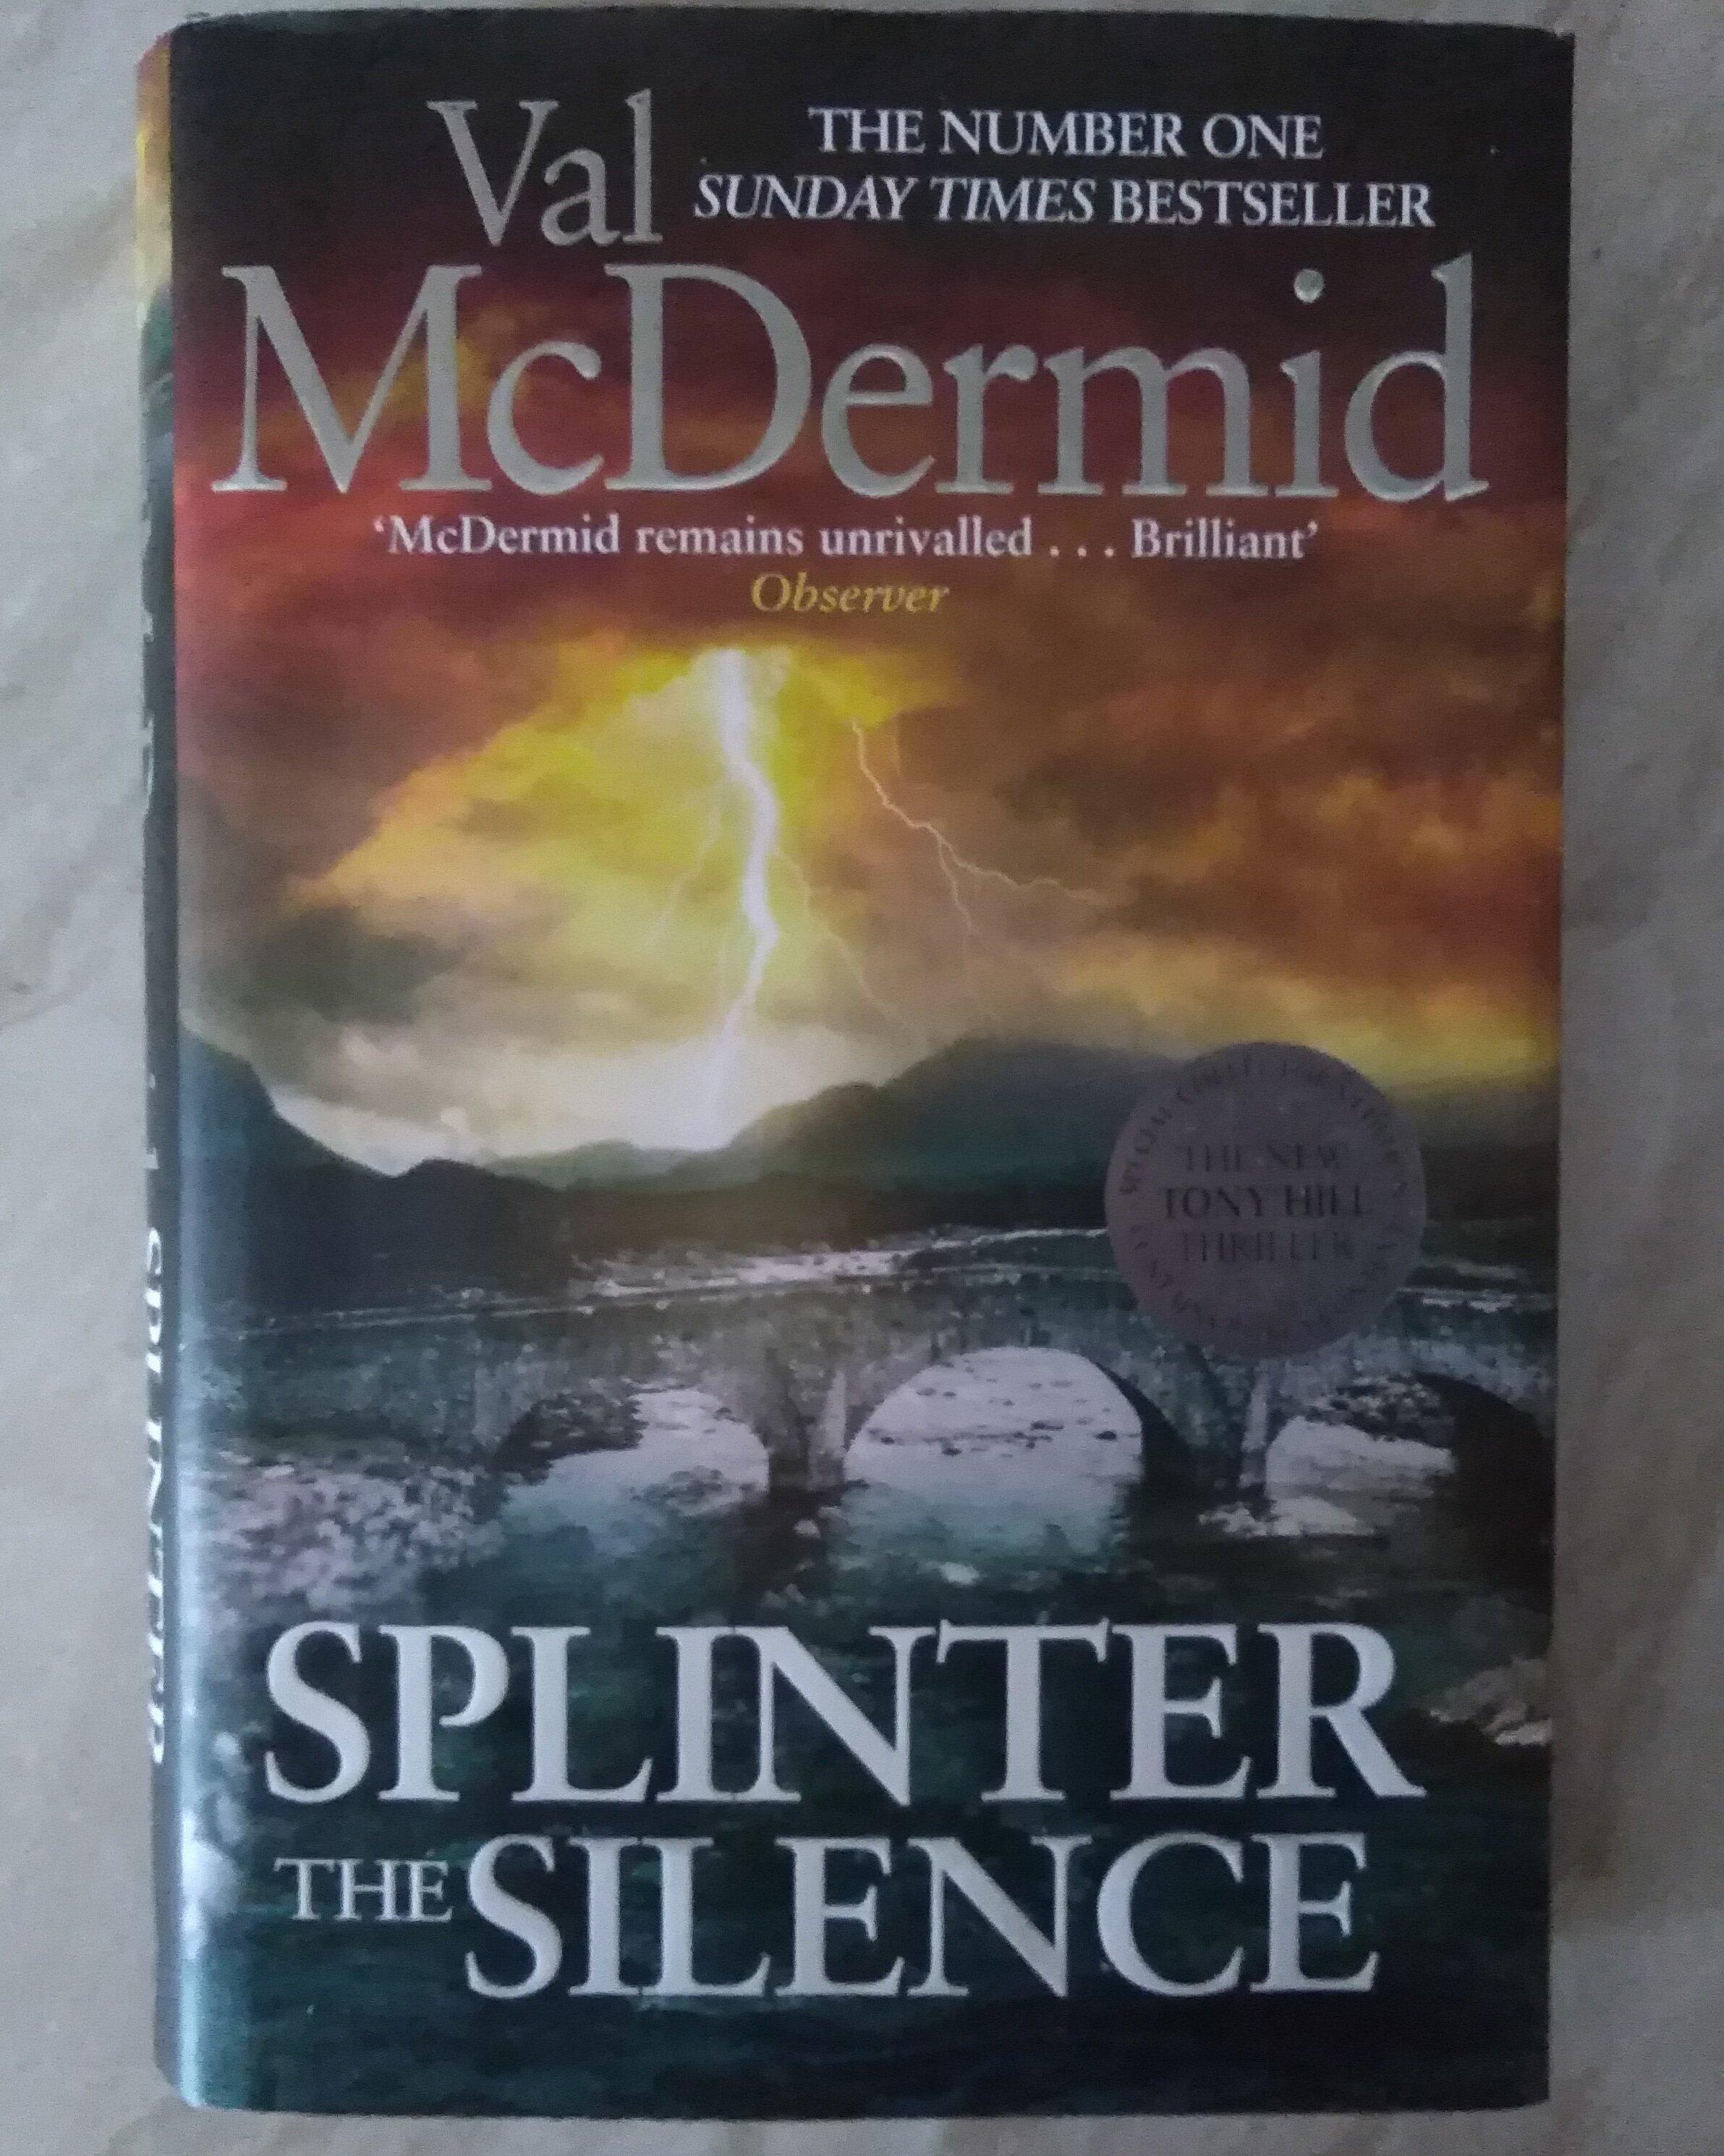 national book day, val mcdermid, splinter the silence, tony hill